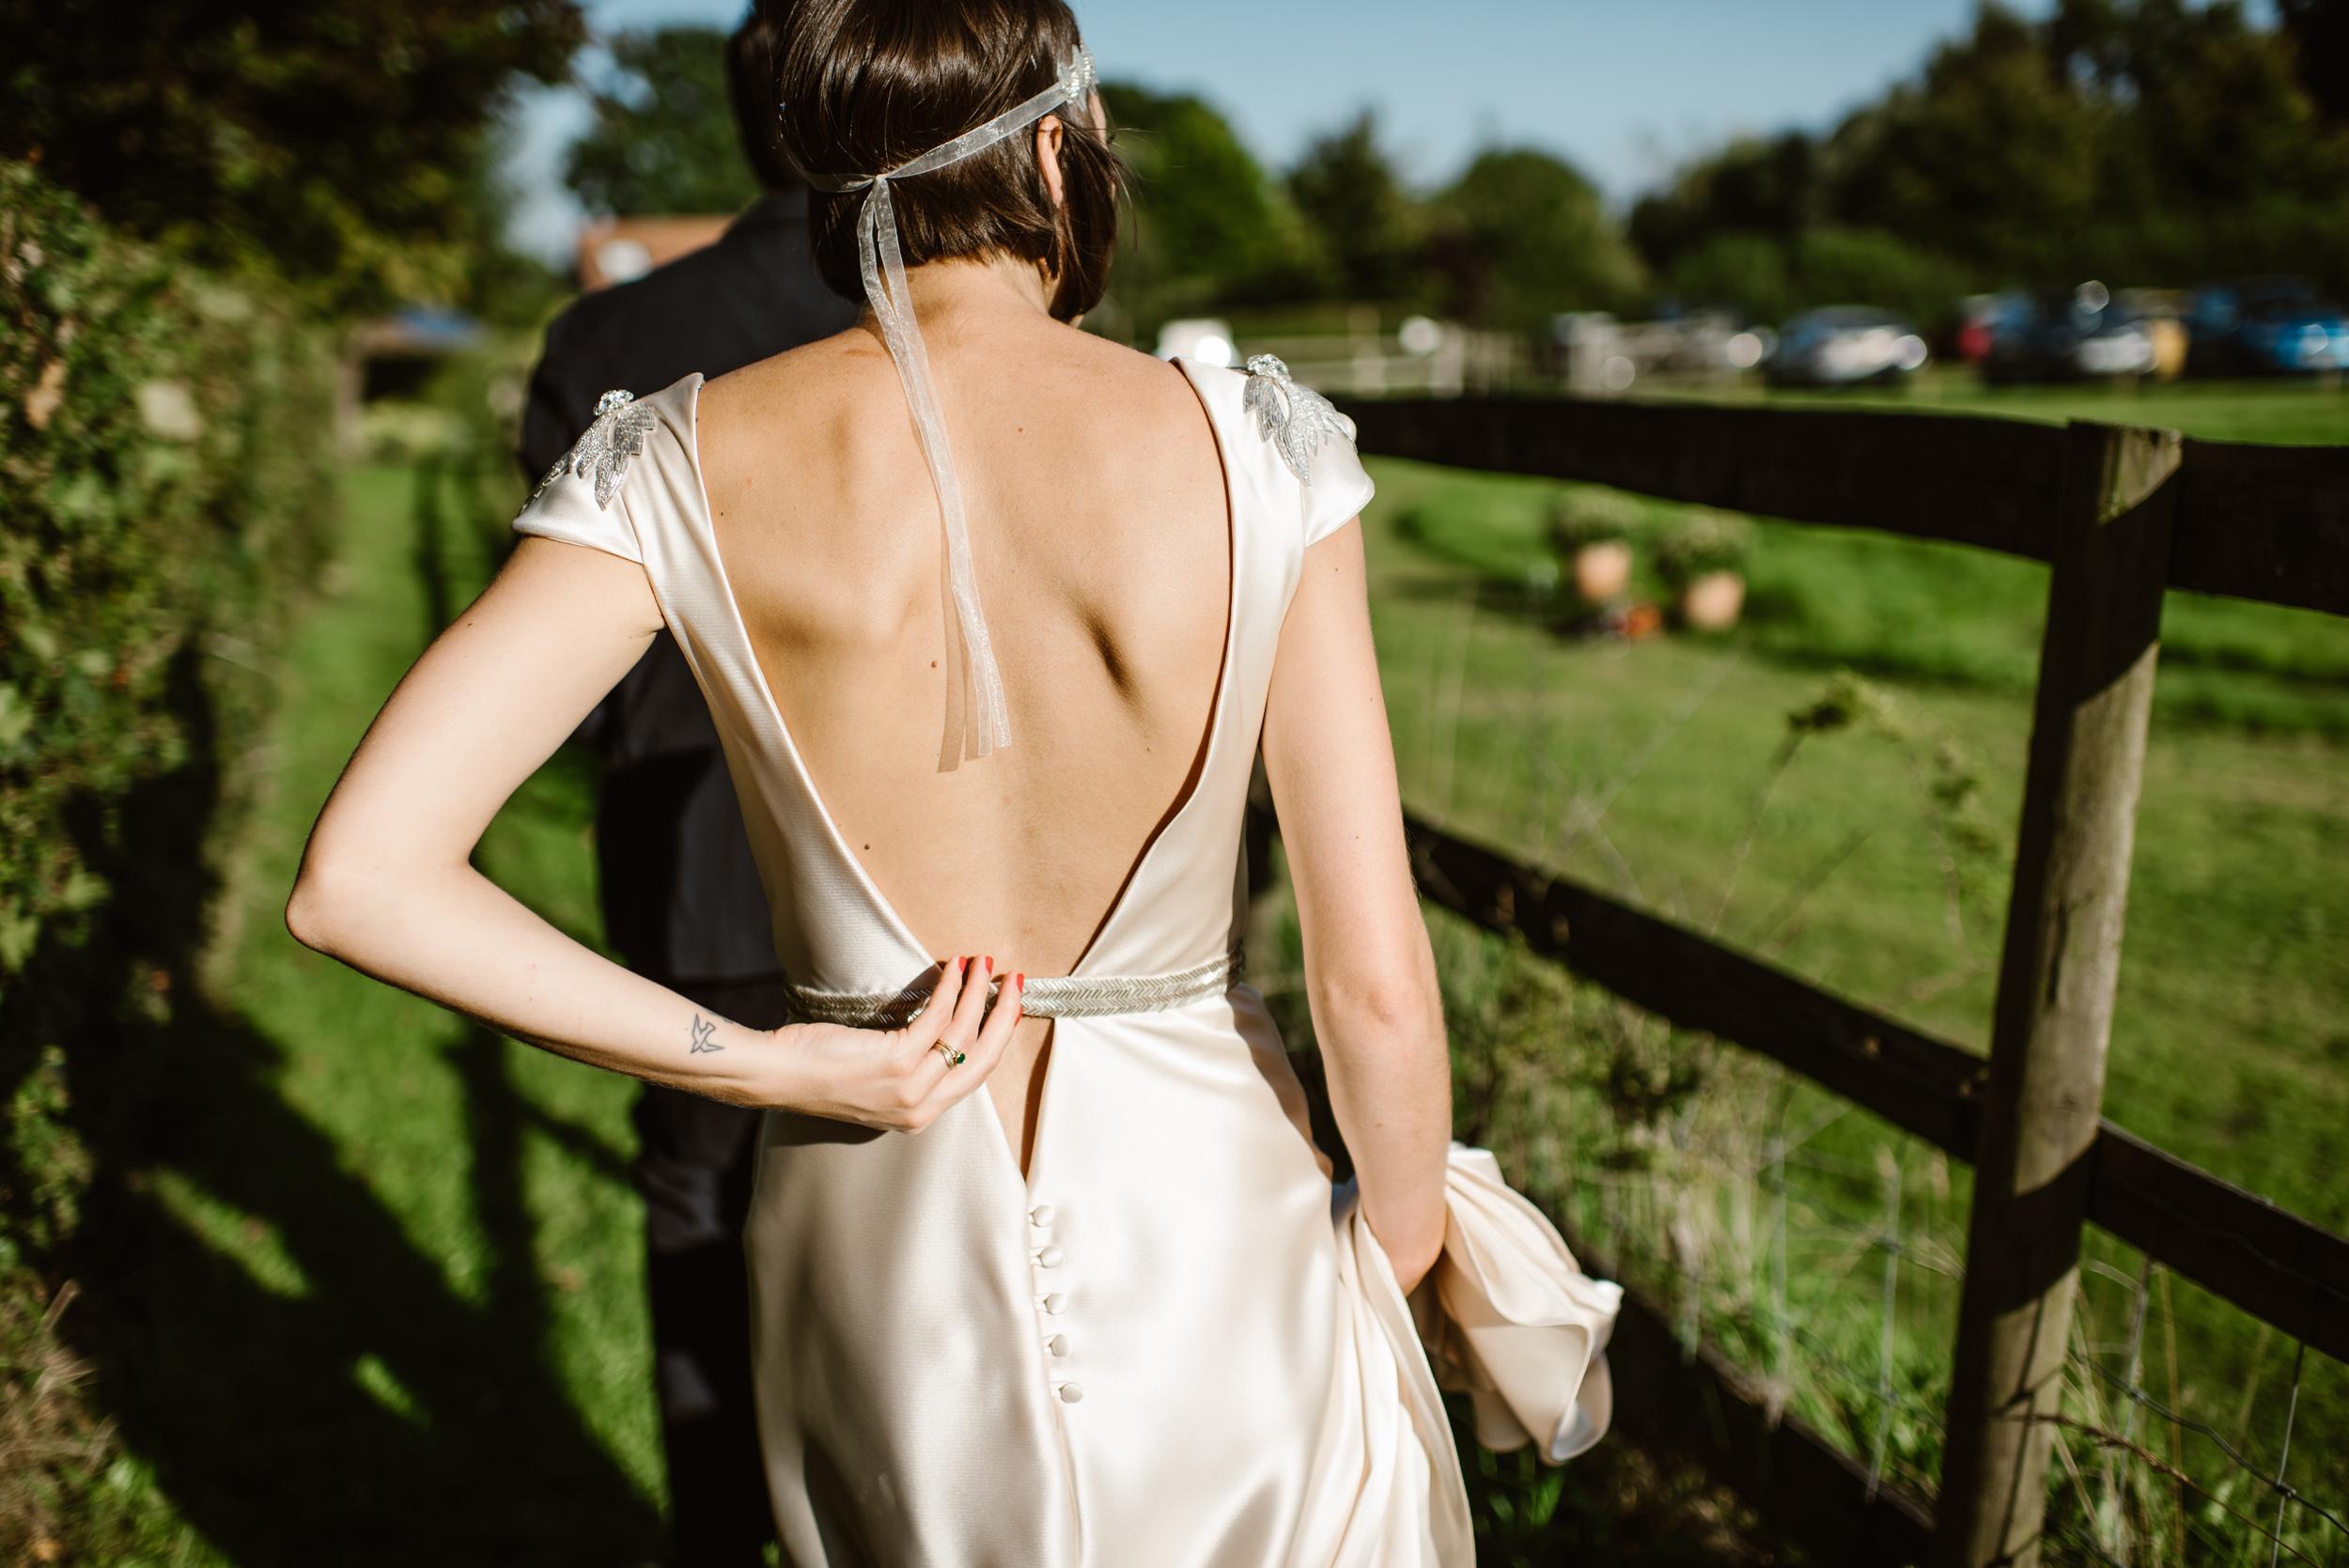 Ro-Kate-Beaumont-bias-cut-silk-wedding-gown-back-garden-wedding-by-Ellie-Gillard-22.jpg